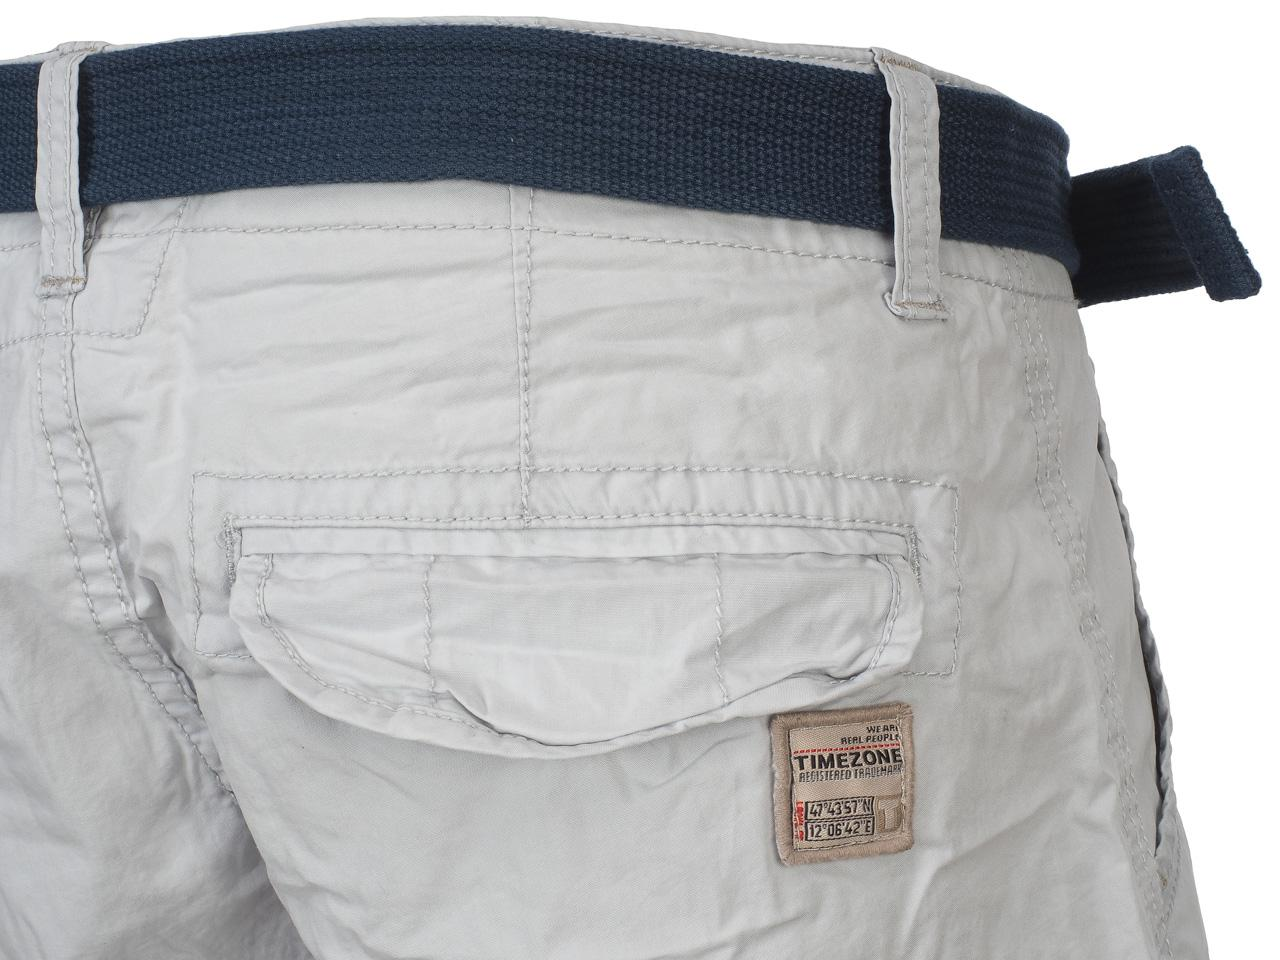 Bermuda-Shorts-Timezone-Russell-Light-Grey-Shorts-Grey-42181-New thumbnail 4